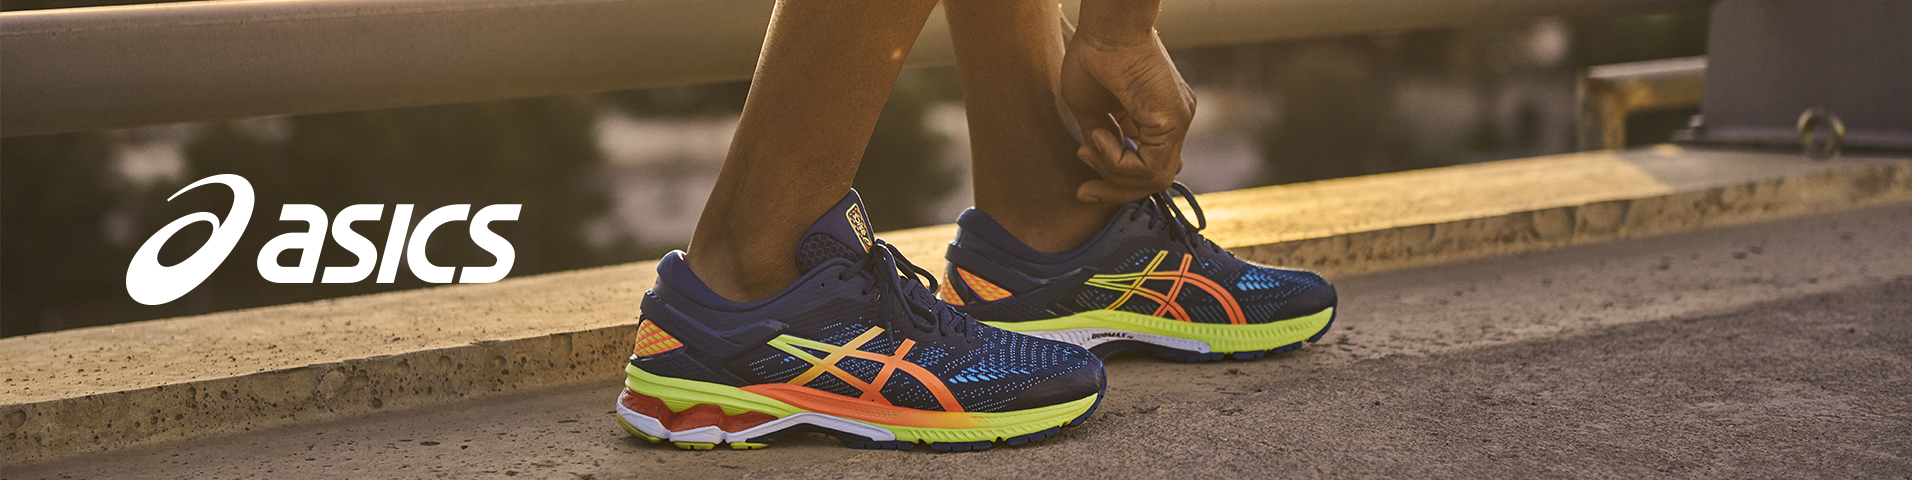 07e89e81 ASICS Men's Sports Shoes | Trainers | ZALANDO UK